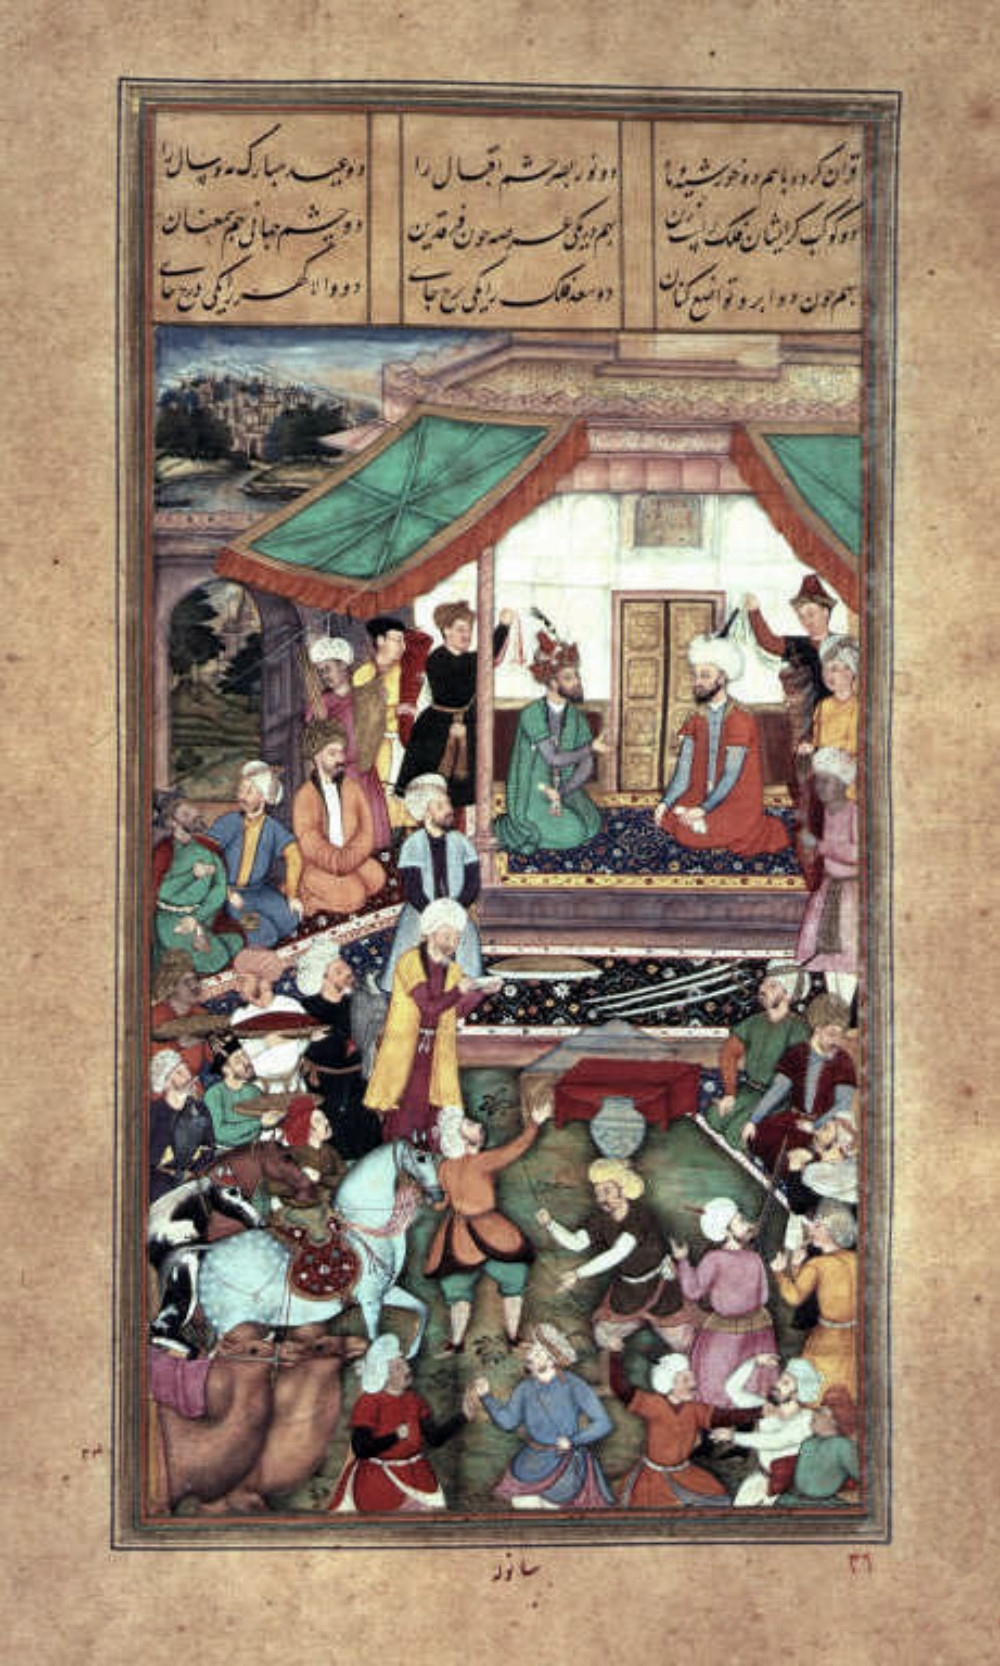 Shah Tahmasp greets the exiled Humayun.